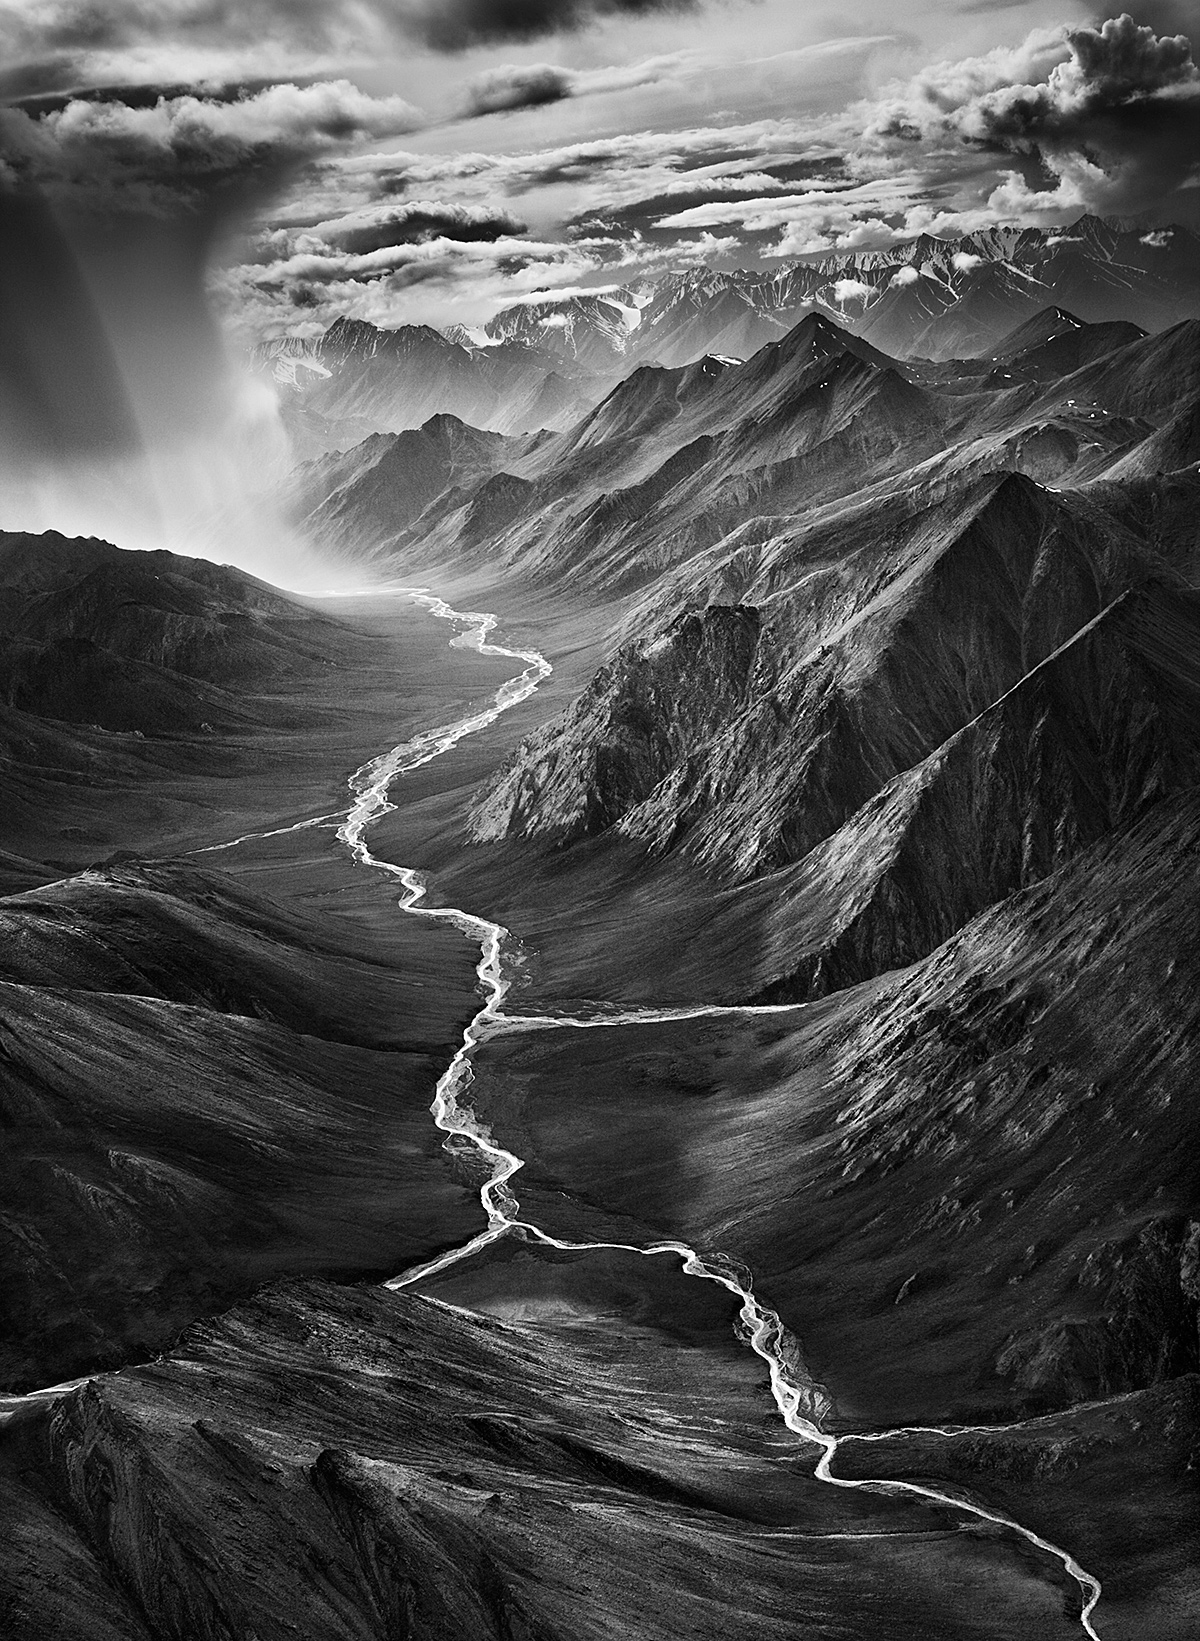 Пейзаж, фотограф: Себастьян Сальгадо